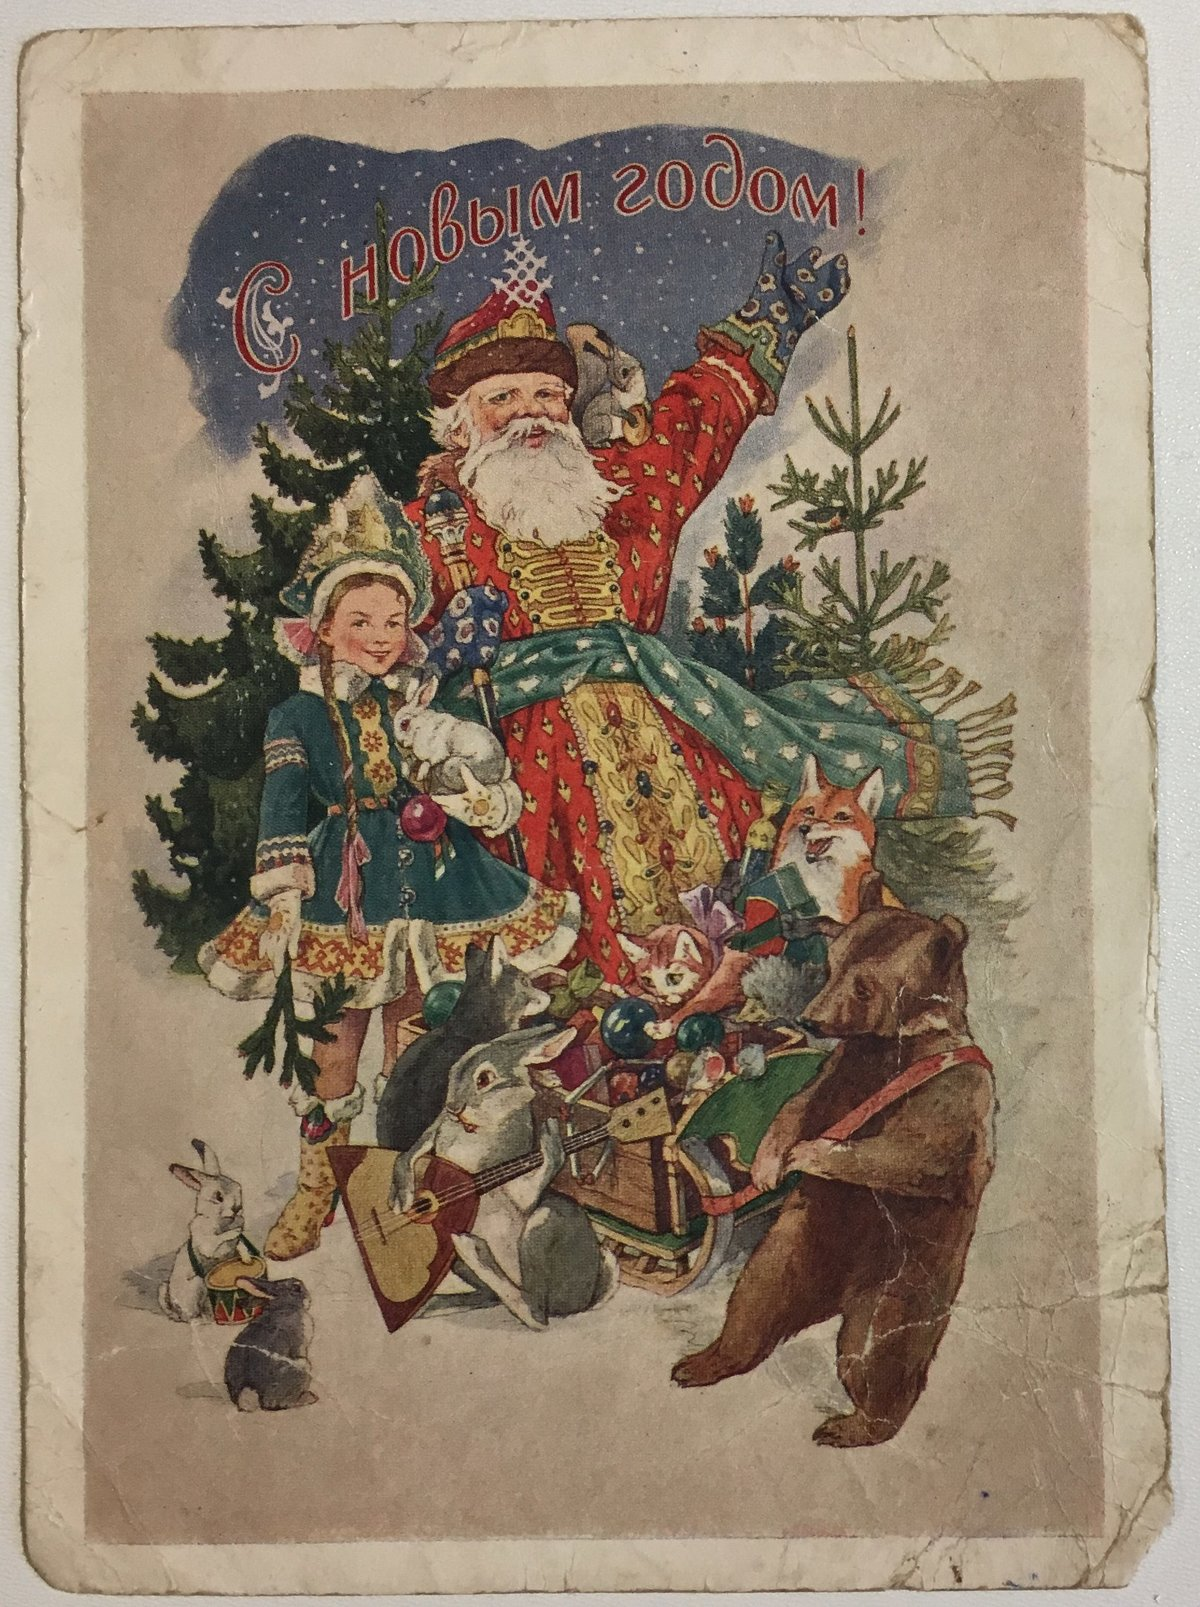 Про мужей, дед мороз на советских открытках фото